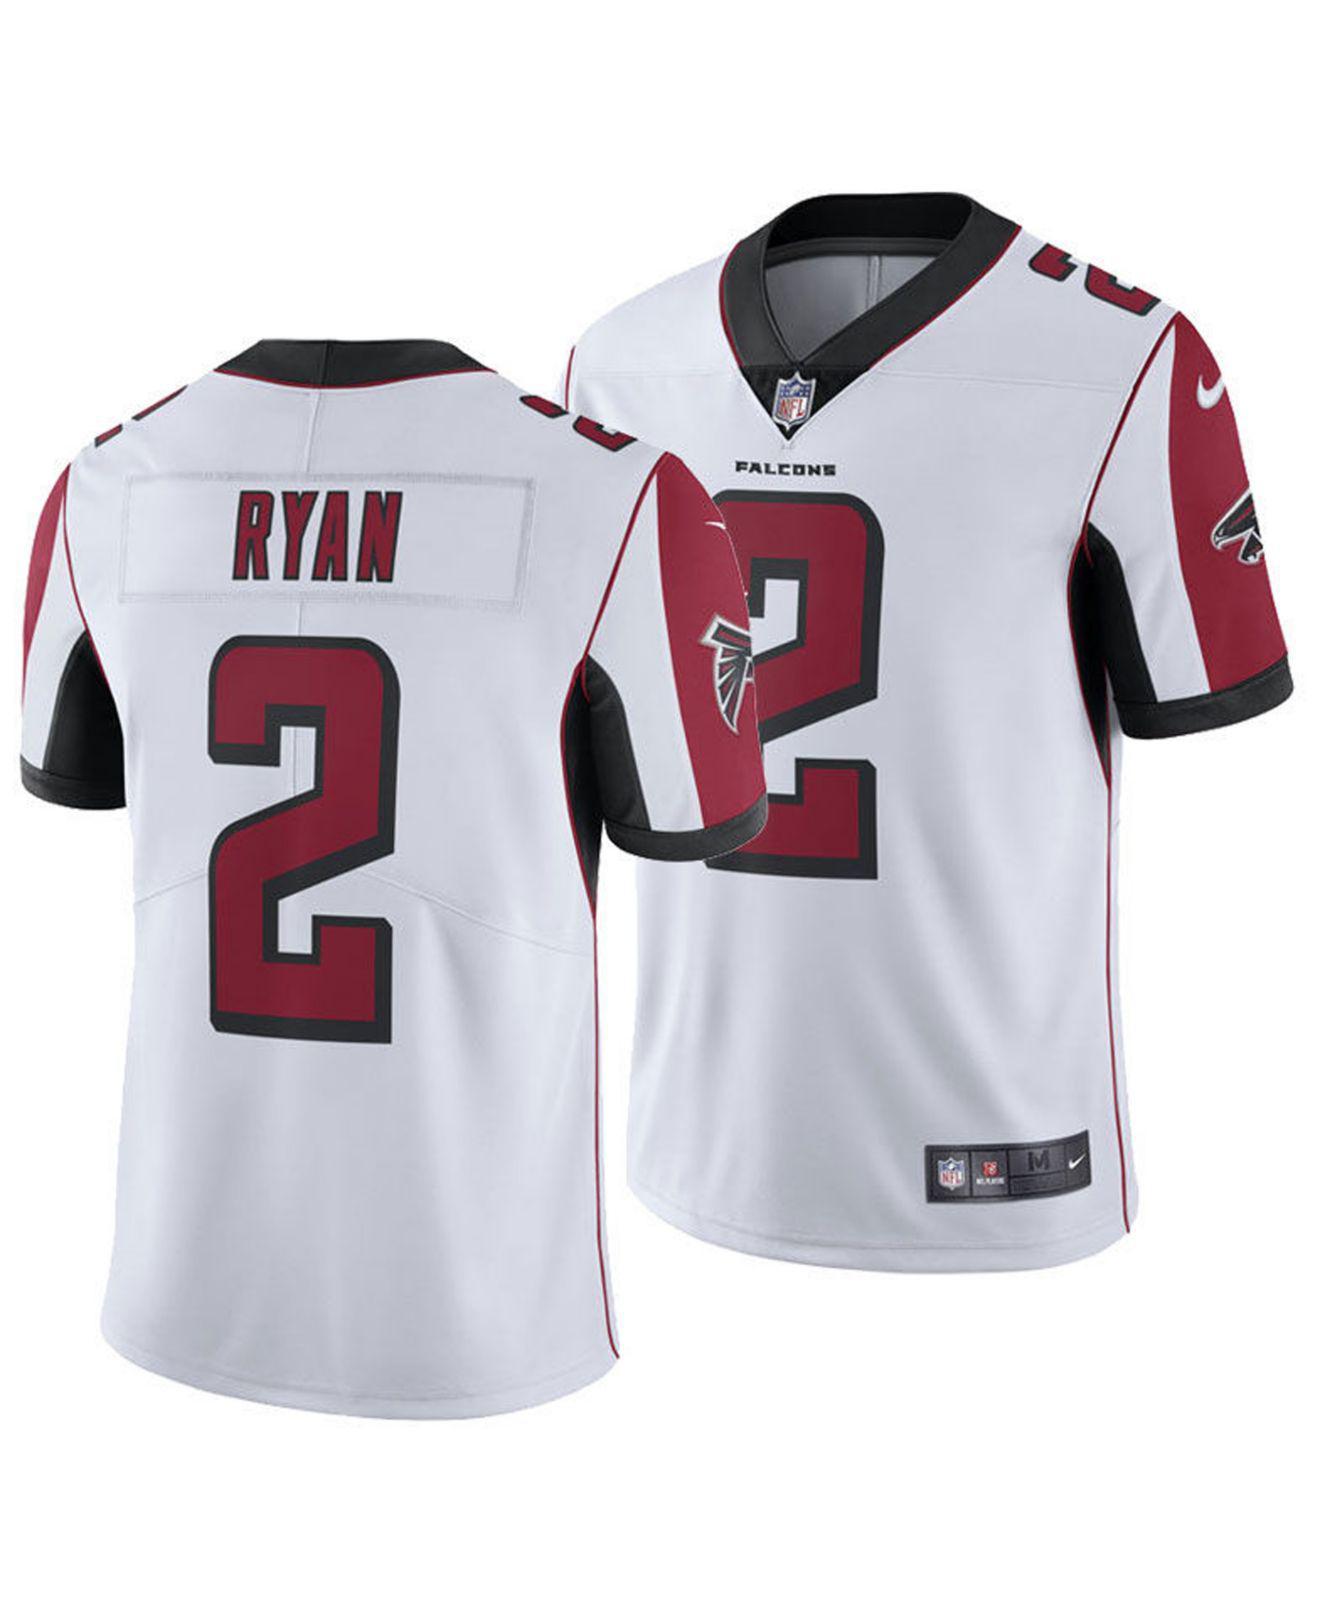 Lyst - Nike Matt Ryan Atlanta Falcons Vapor Untouchable Limited ... 1a7657727